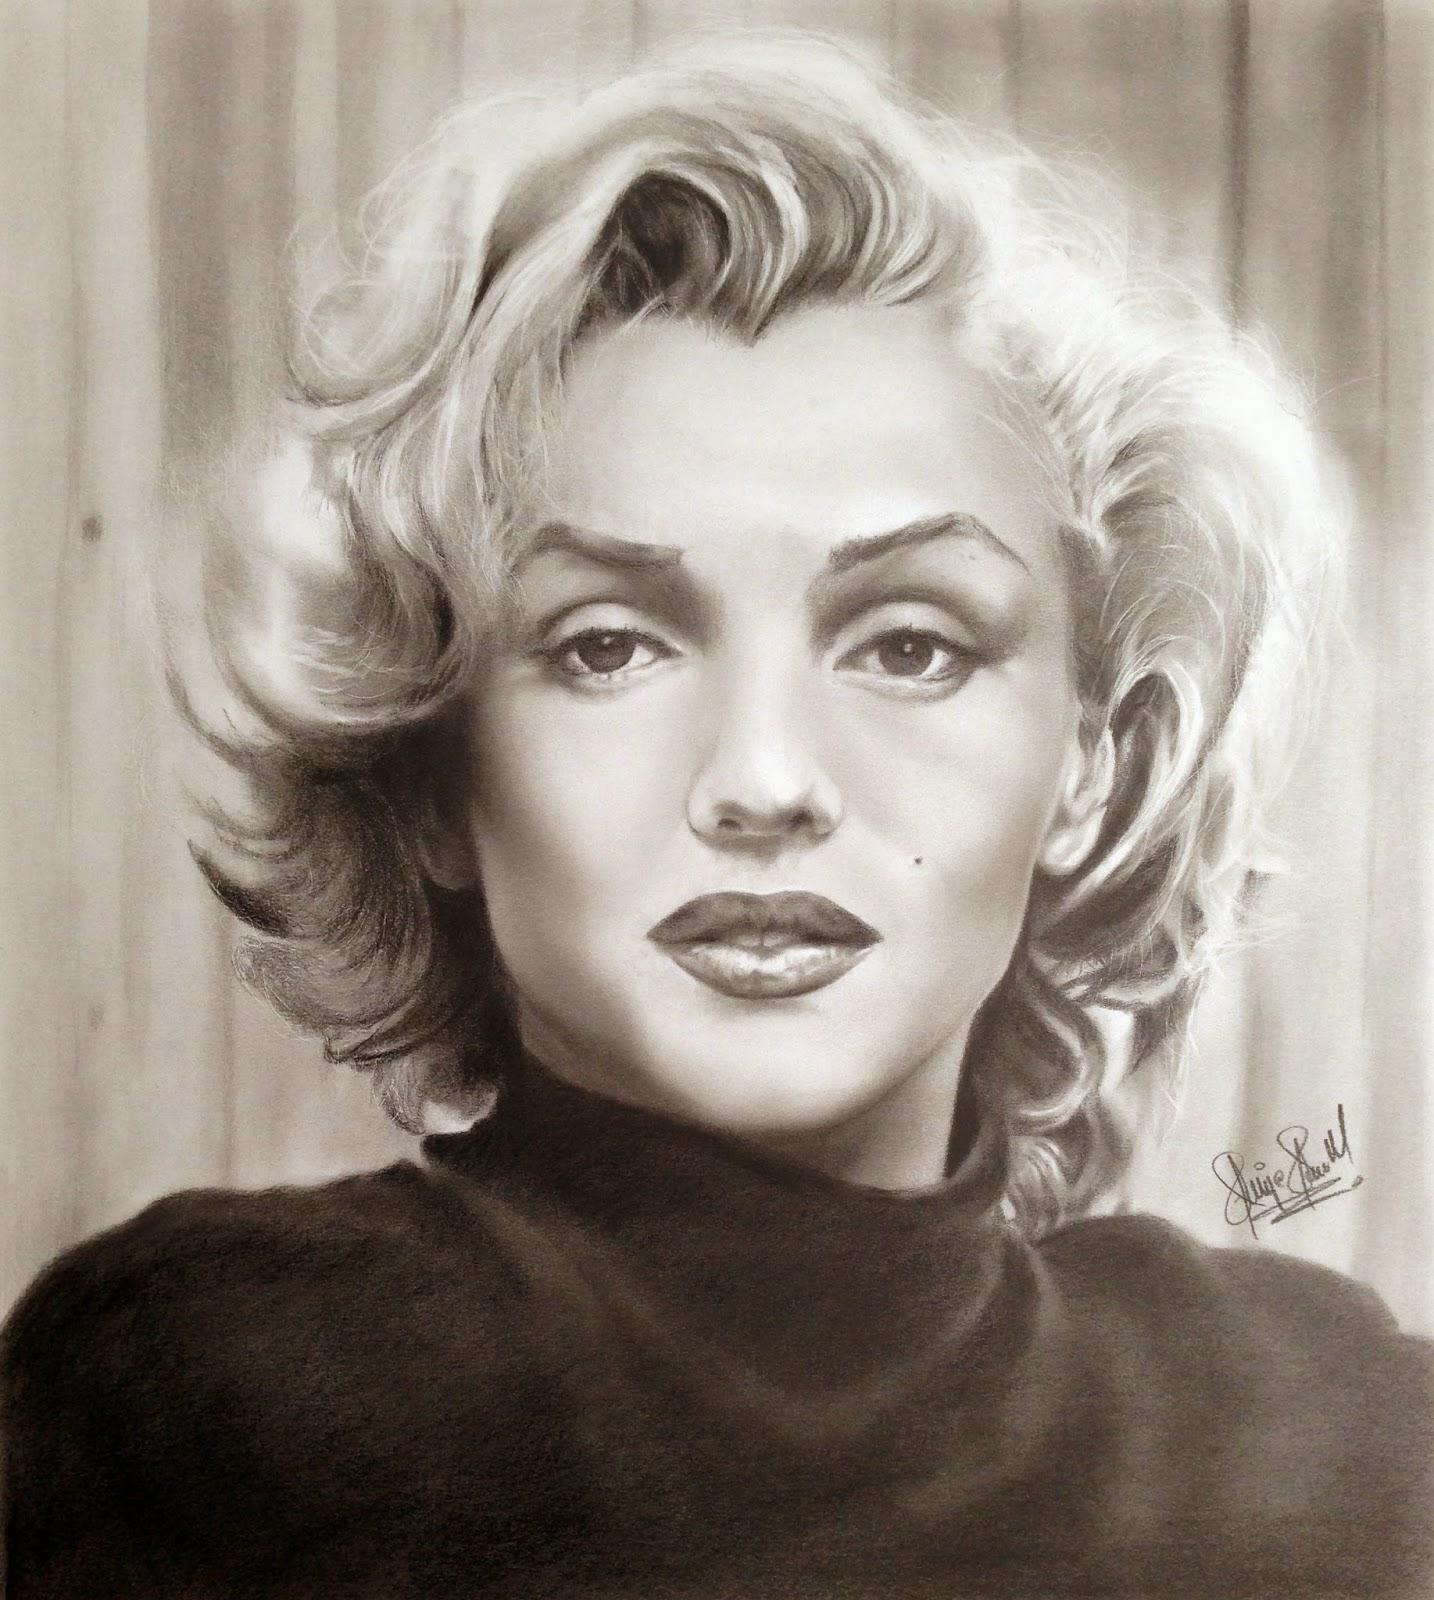 felipe galindo, pencil, drawings, portraits, retratos a